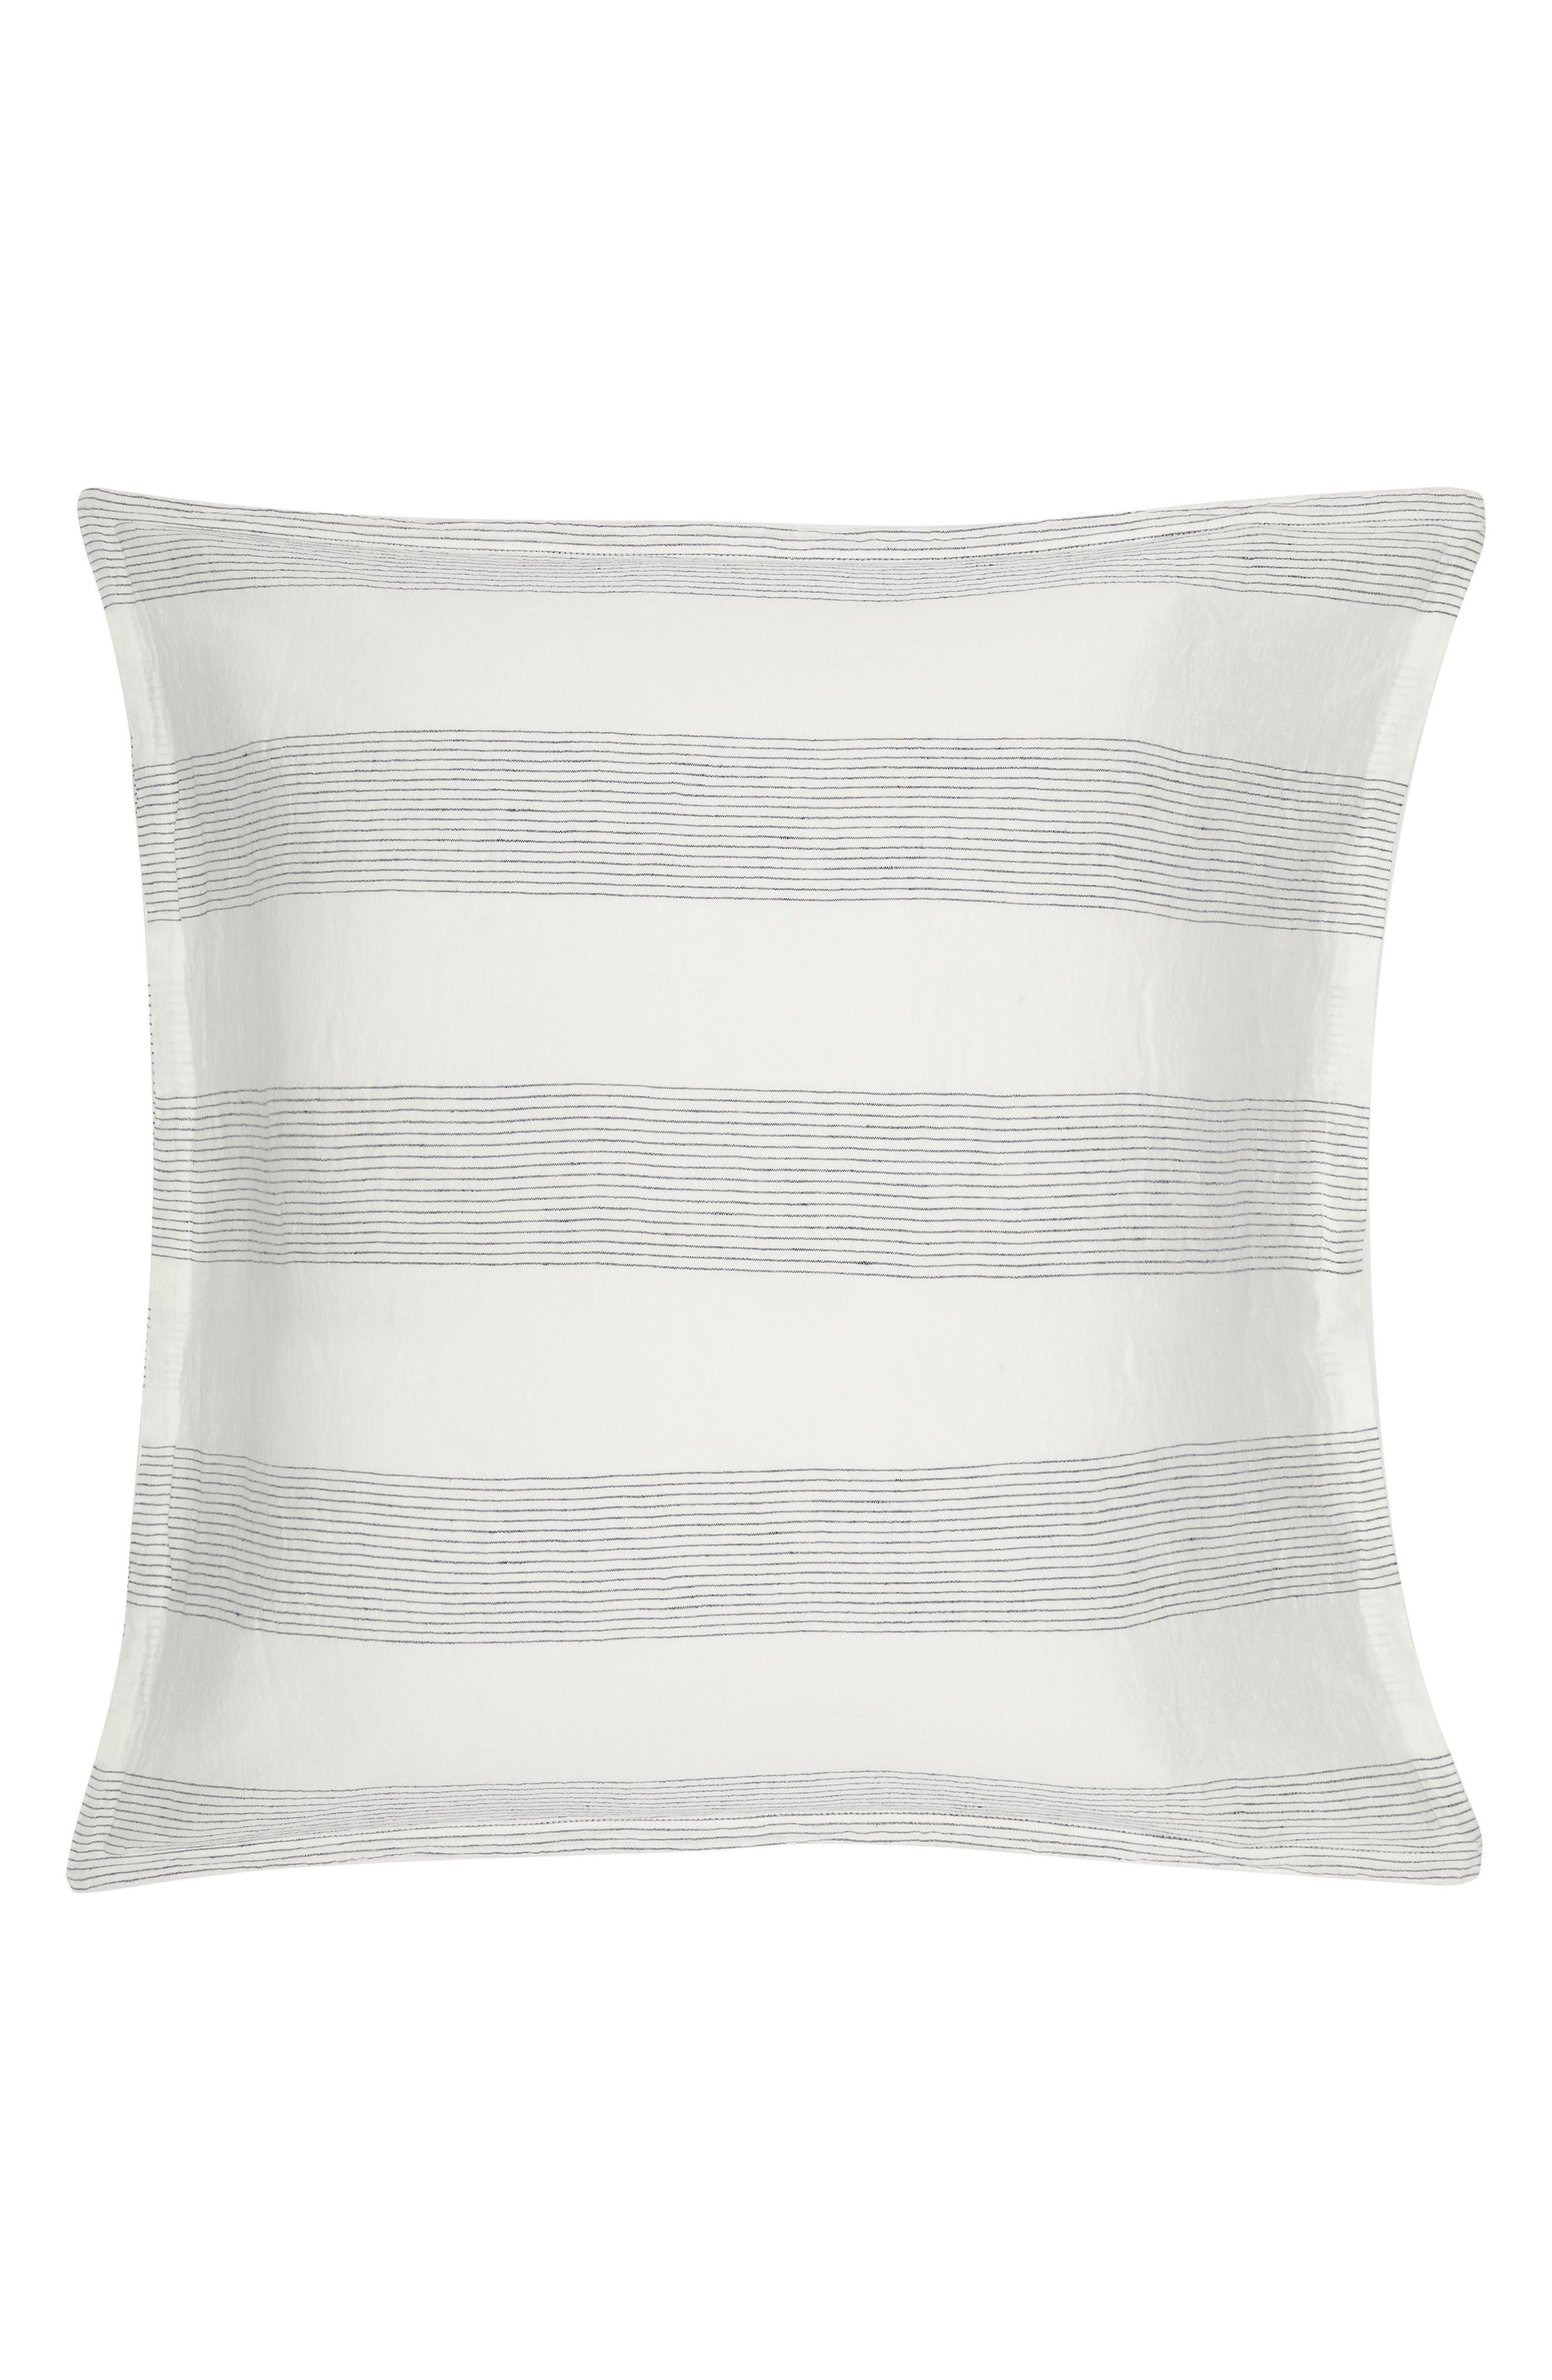 Amagansett Linen Euro Sham,                         Main,                         color, White/ Indigo